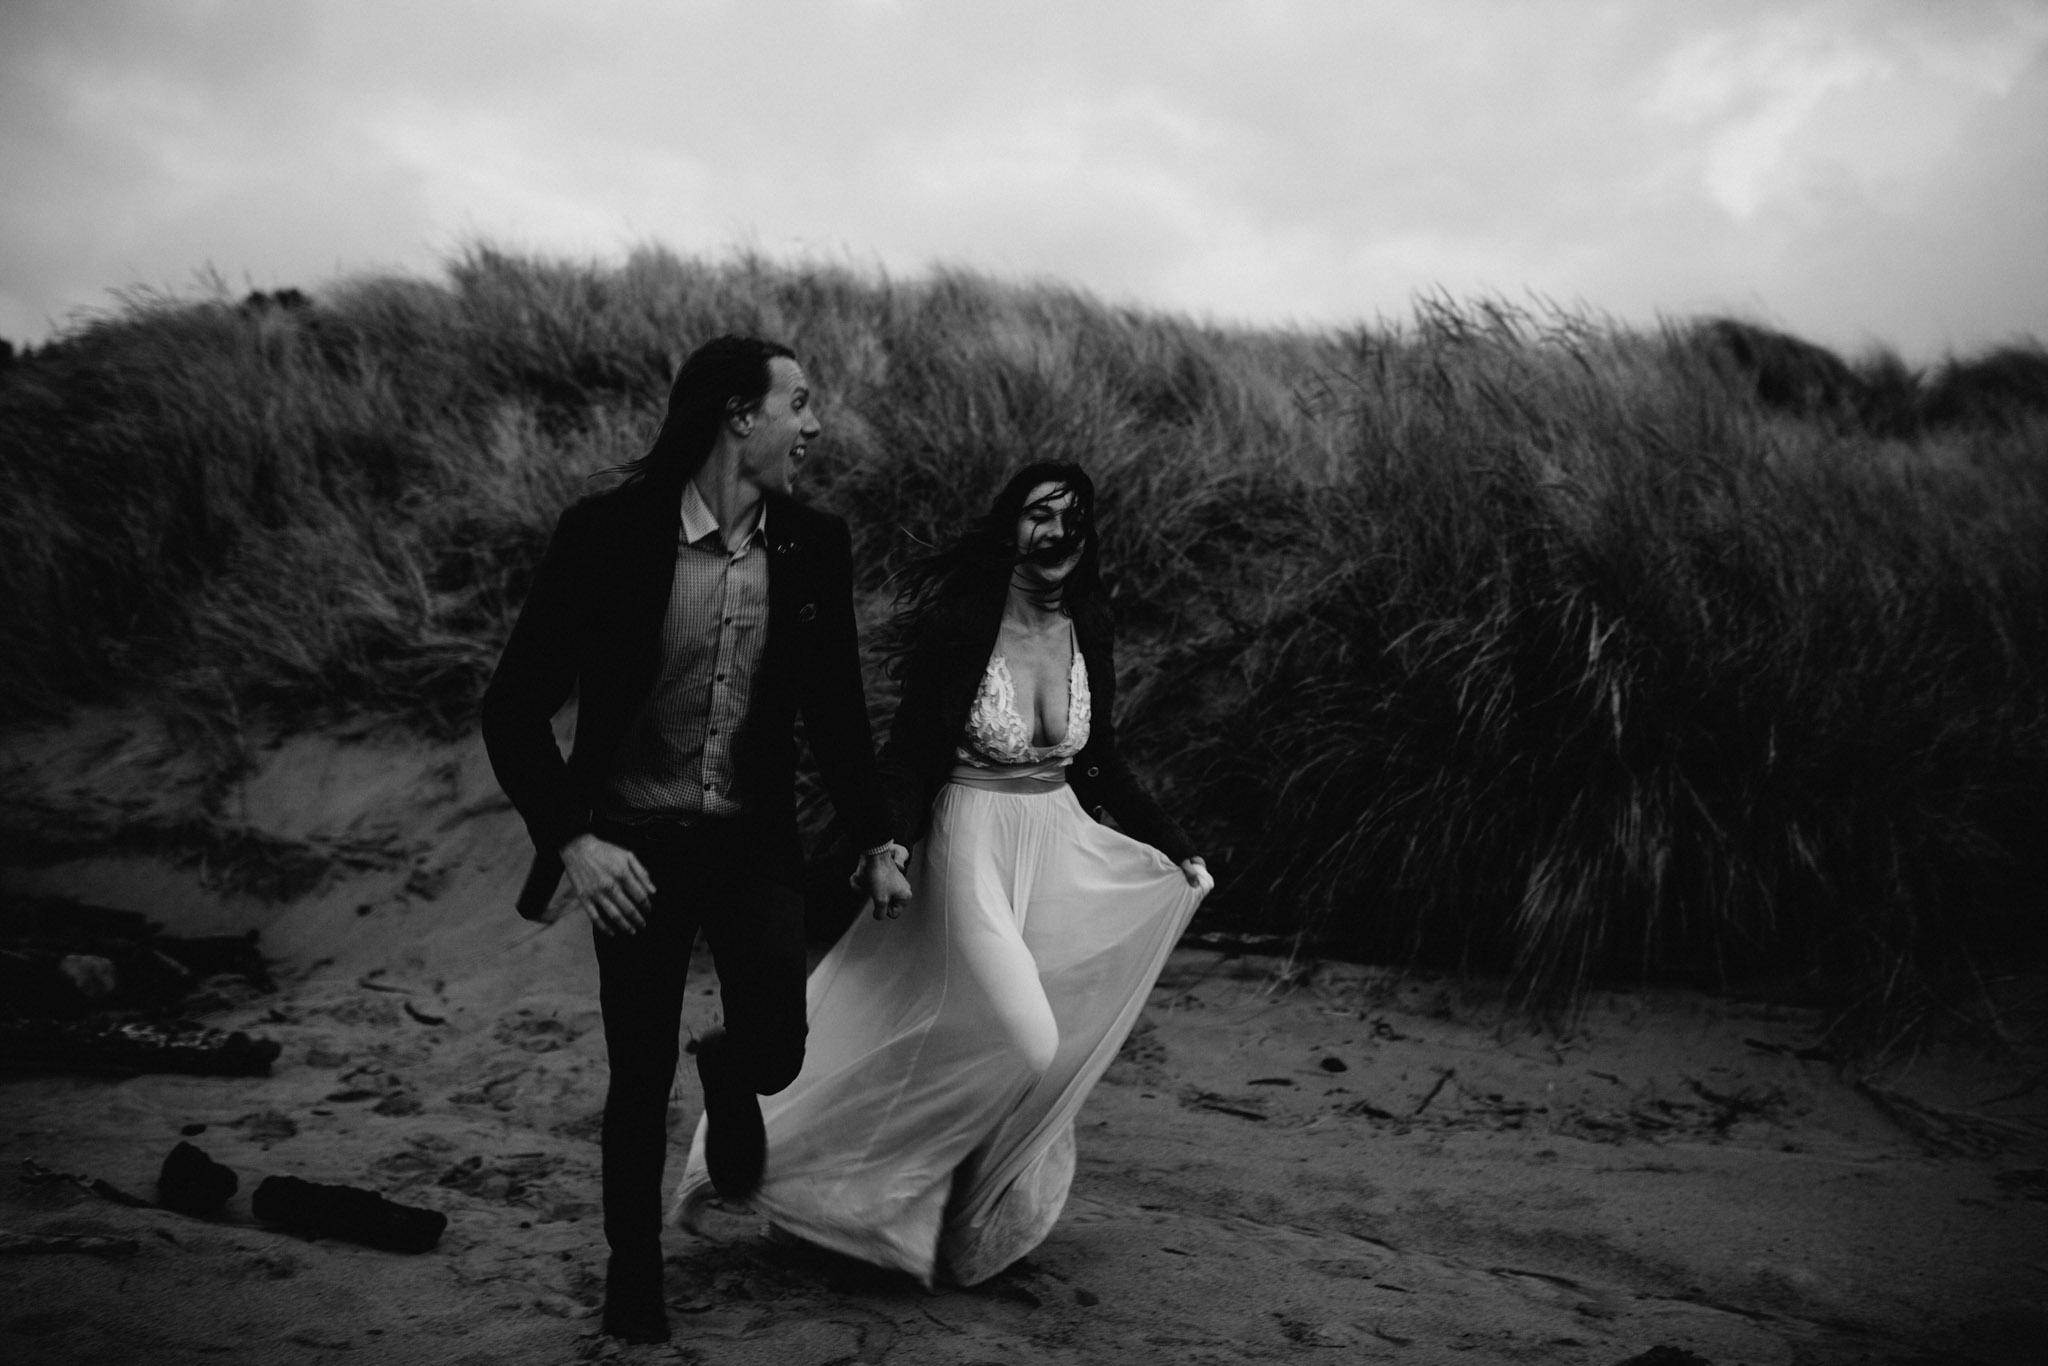 Oregon-Coast-Manzanita-Beach-Engagement-Pia-Anna-Christian-Wedding-Photography-PNW-GB-48.jpg